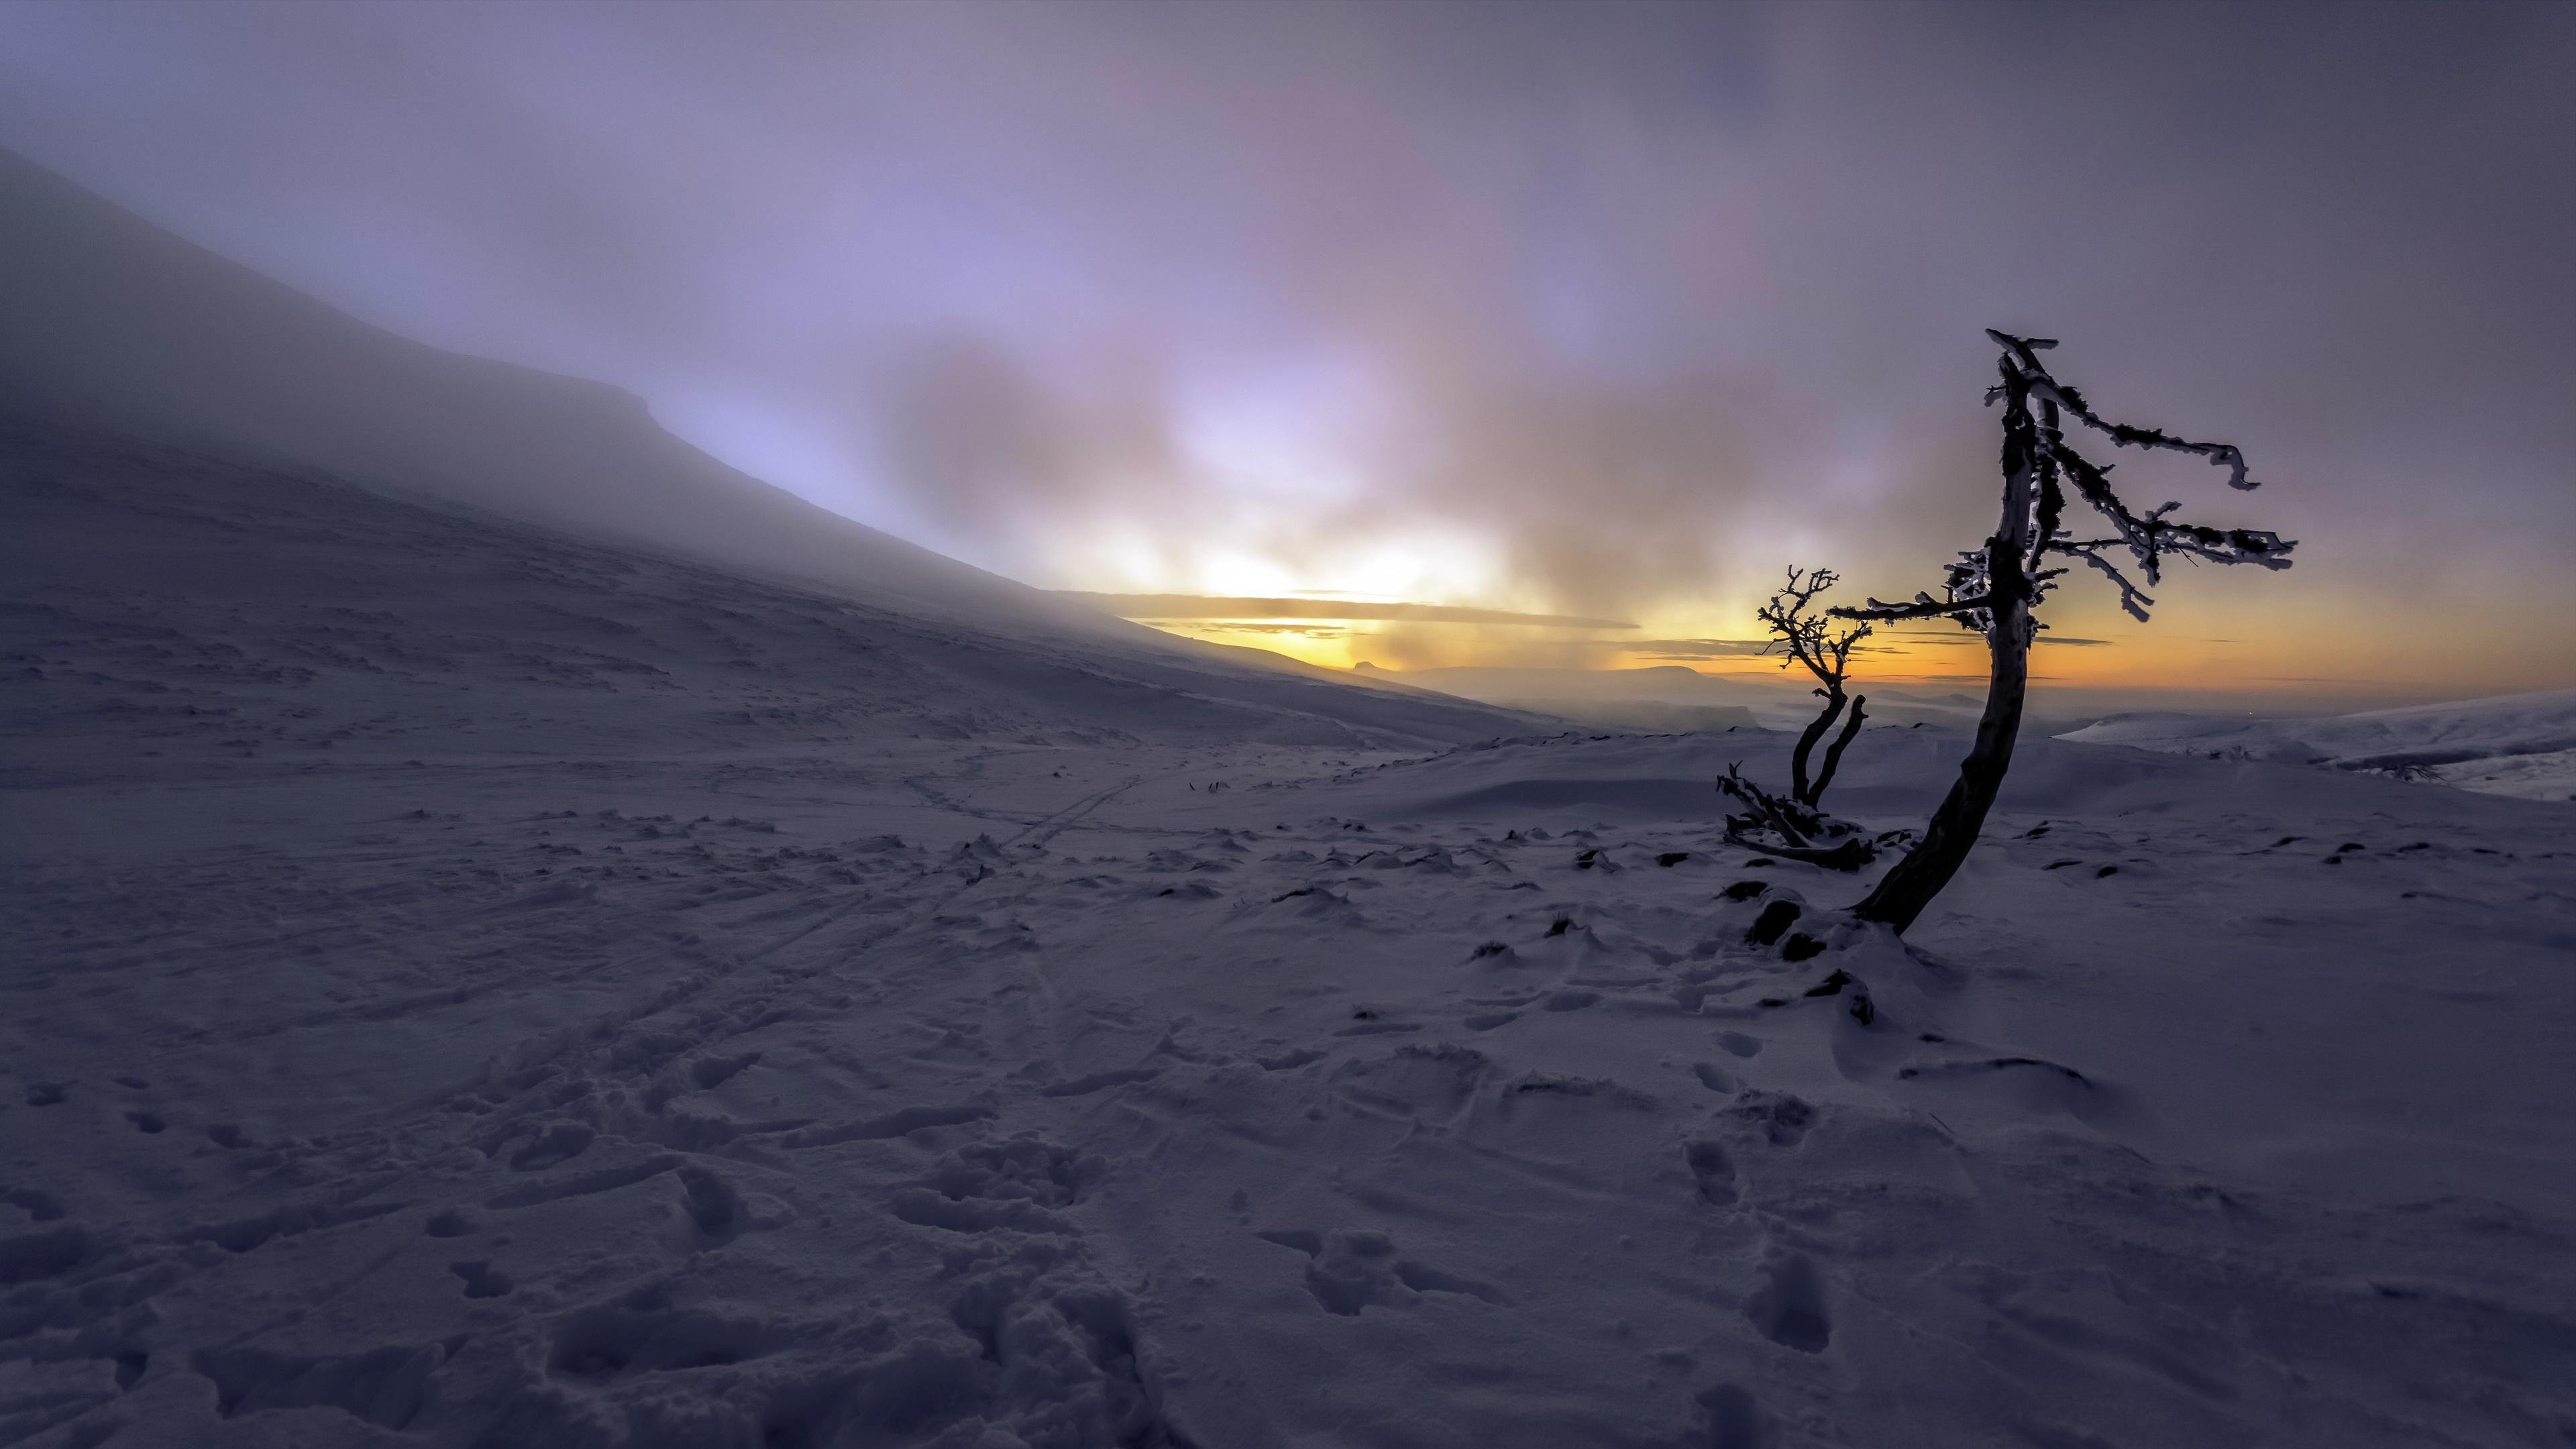 Nature Winter Dark Sunlight Cold Snow Ice Outdoors 3840x2160